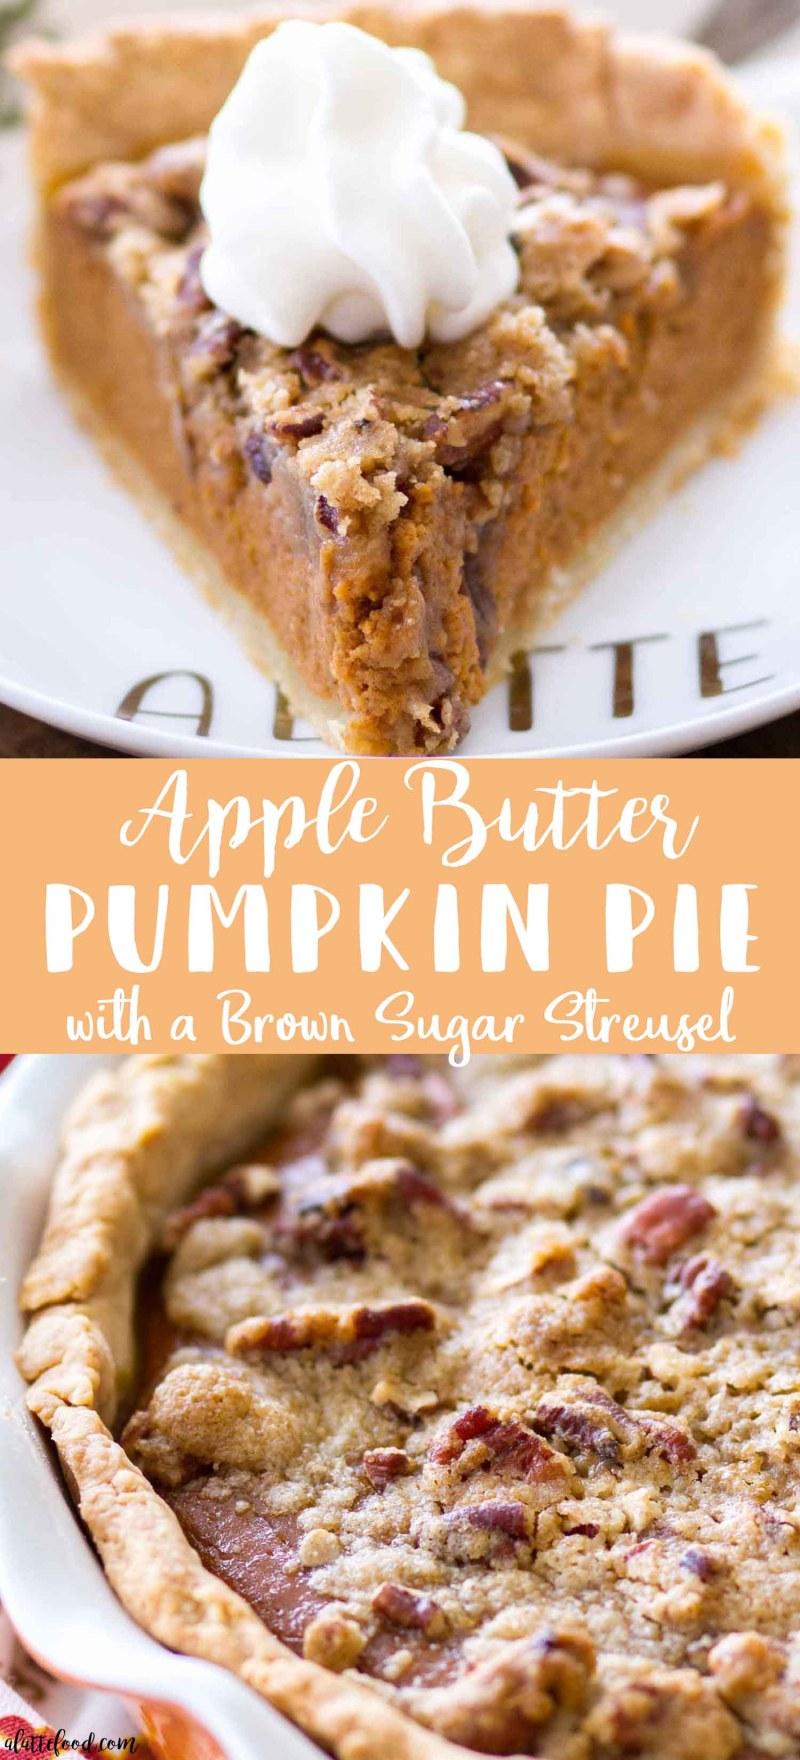 Homemade Apple Butter Pumpkin Pie with a Brown Sugar Streusel Topping (how to make pumpkin pie with a streusel topping)